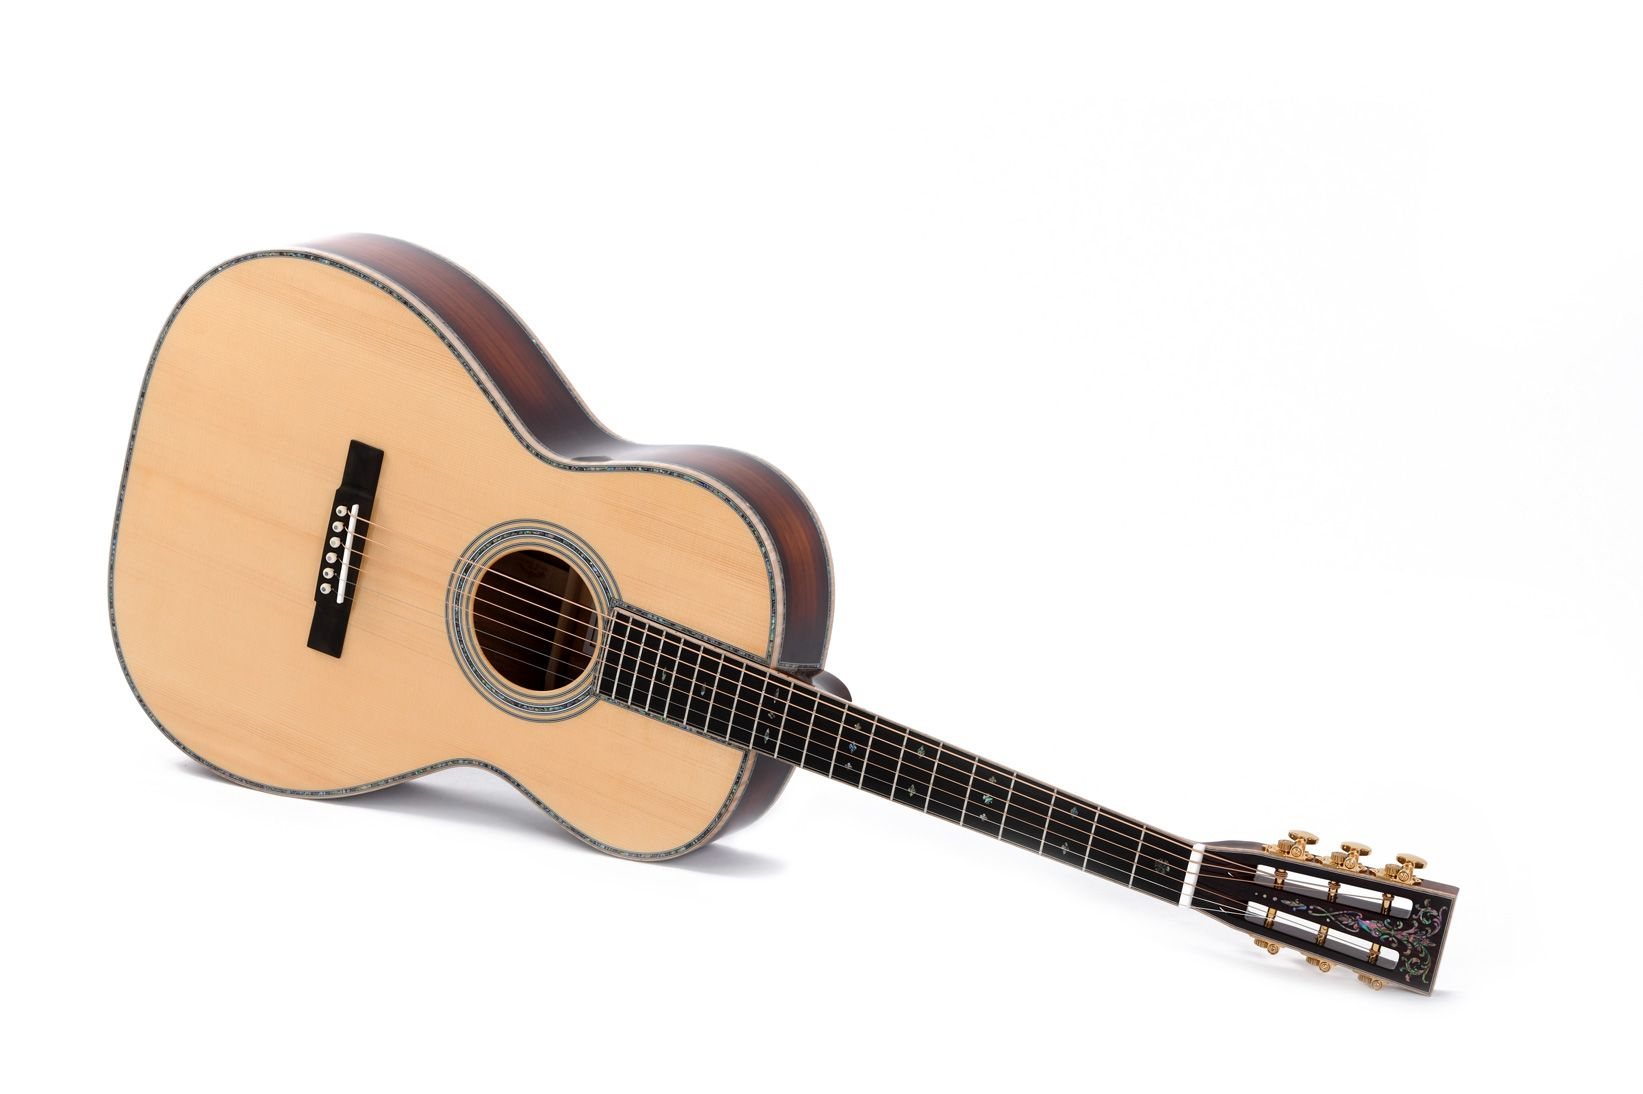 S000b 45vs Limited Sigma Guitars Guitar Acoustic Black Ebony